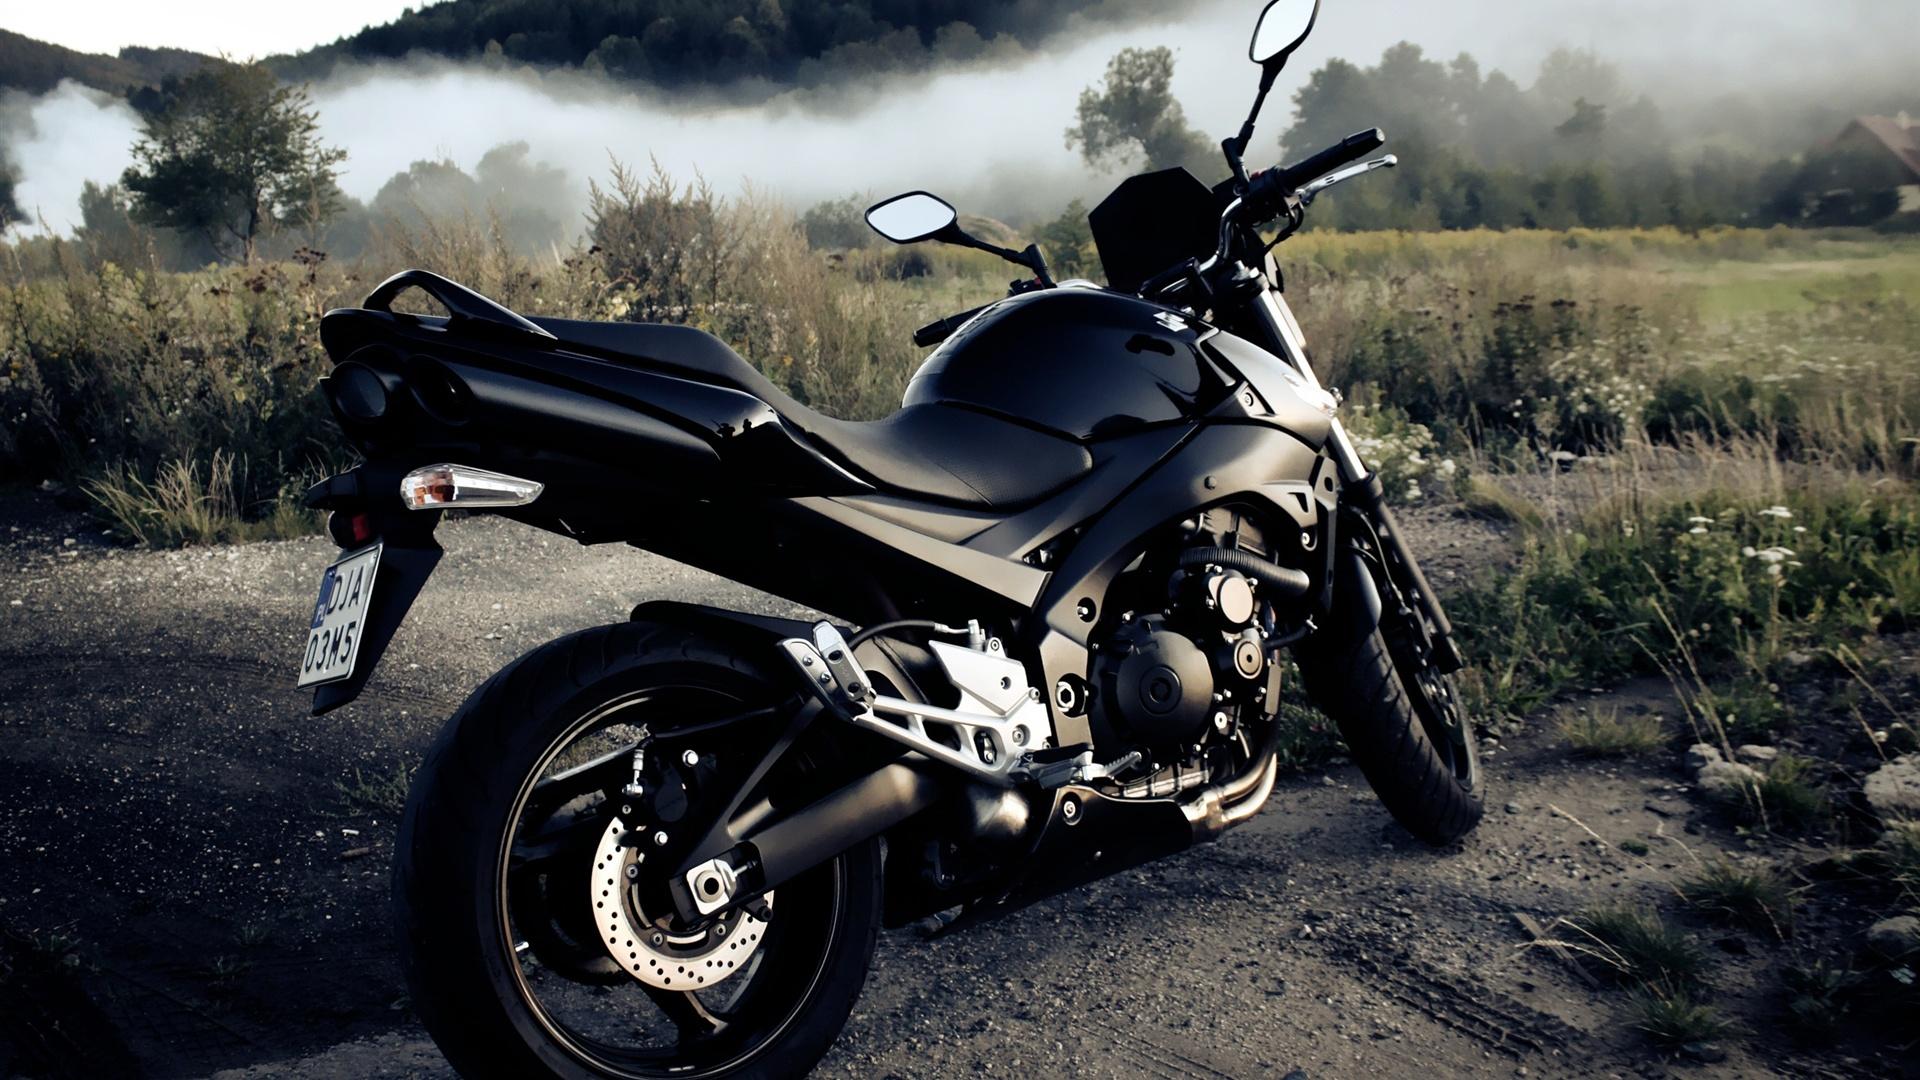 suzuki motocross bike hd - photo #10